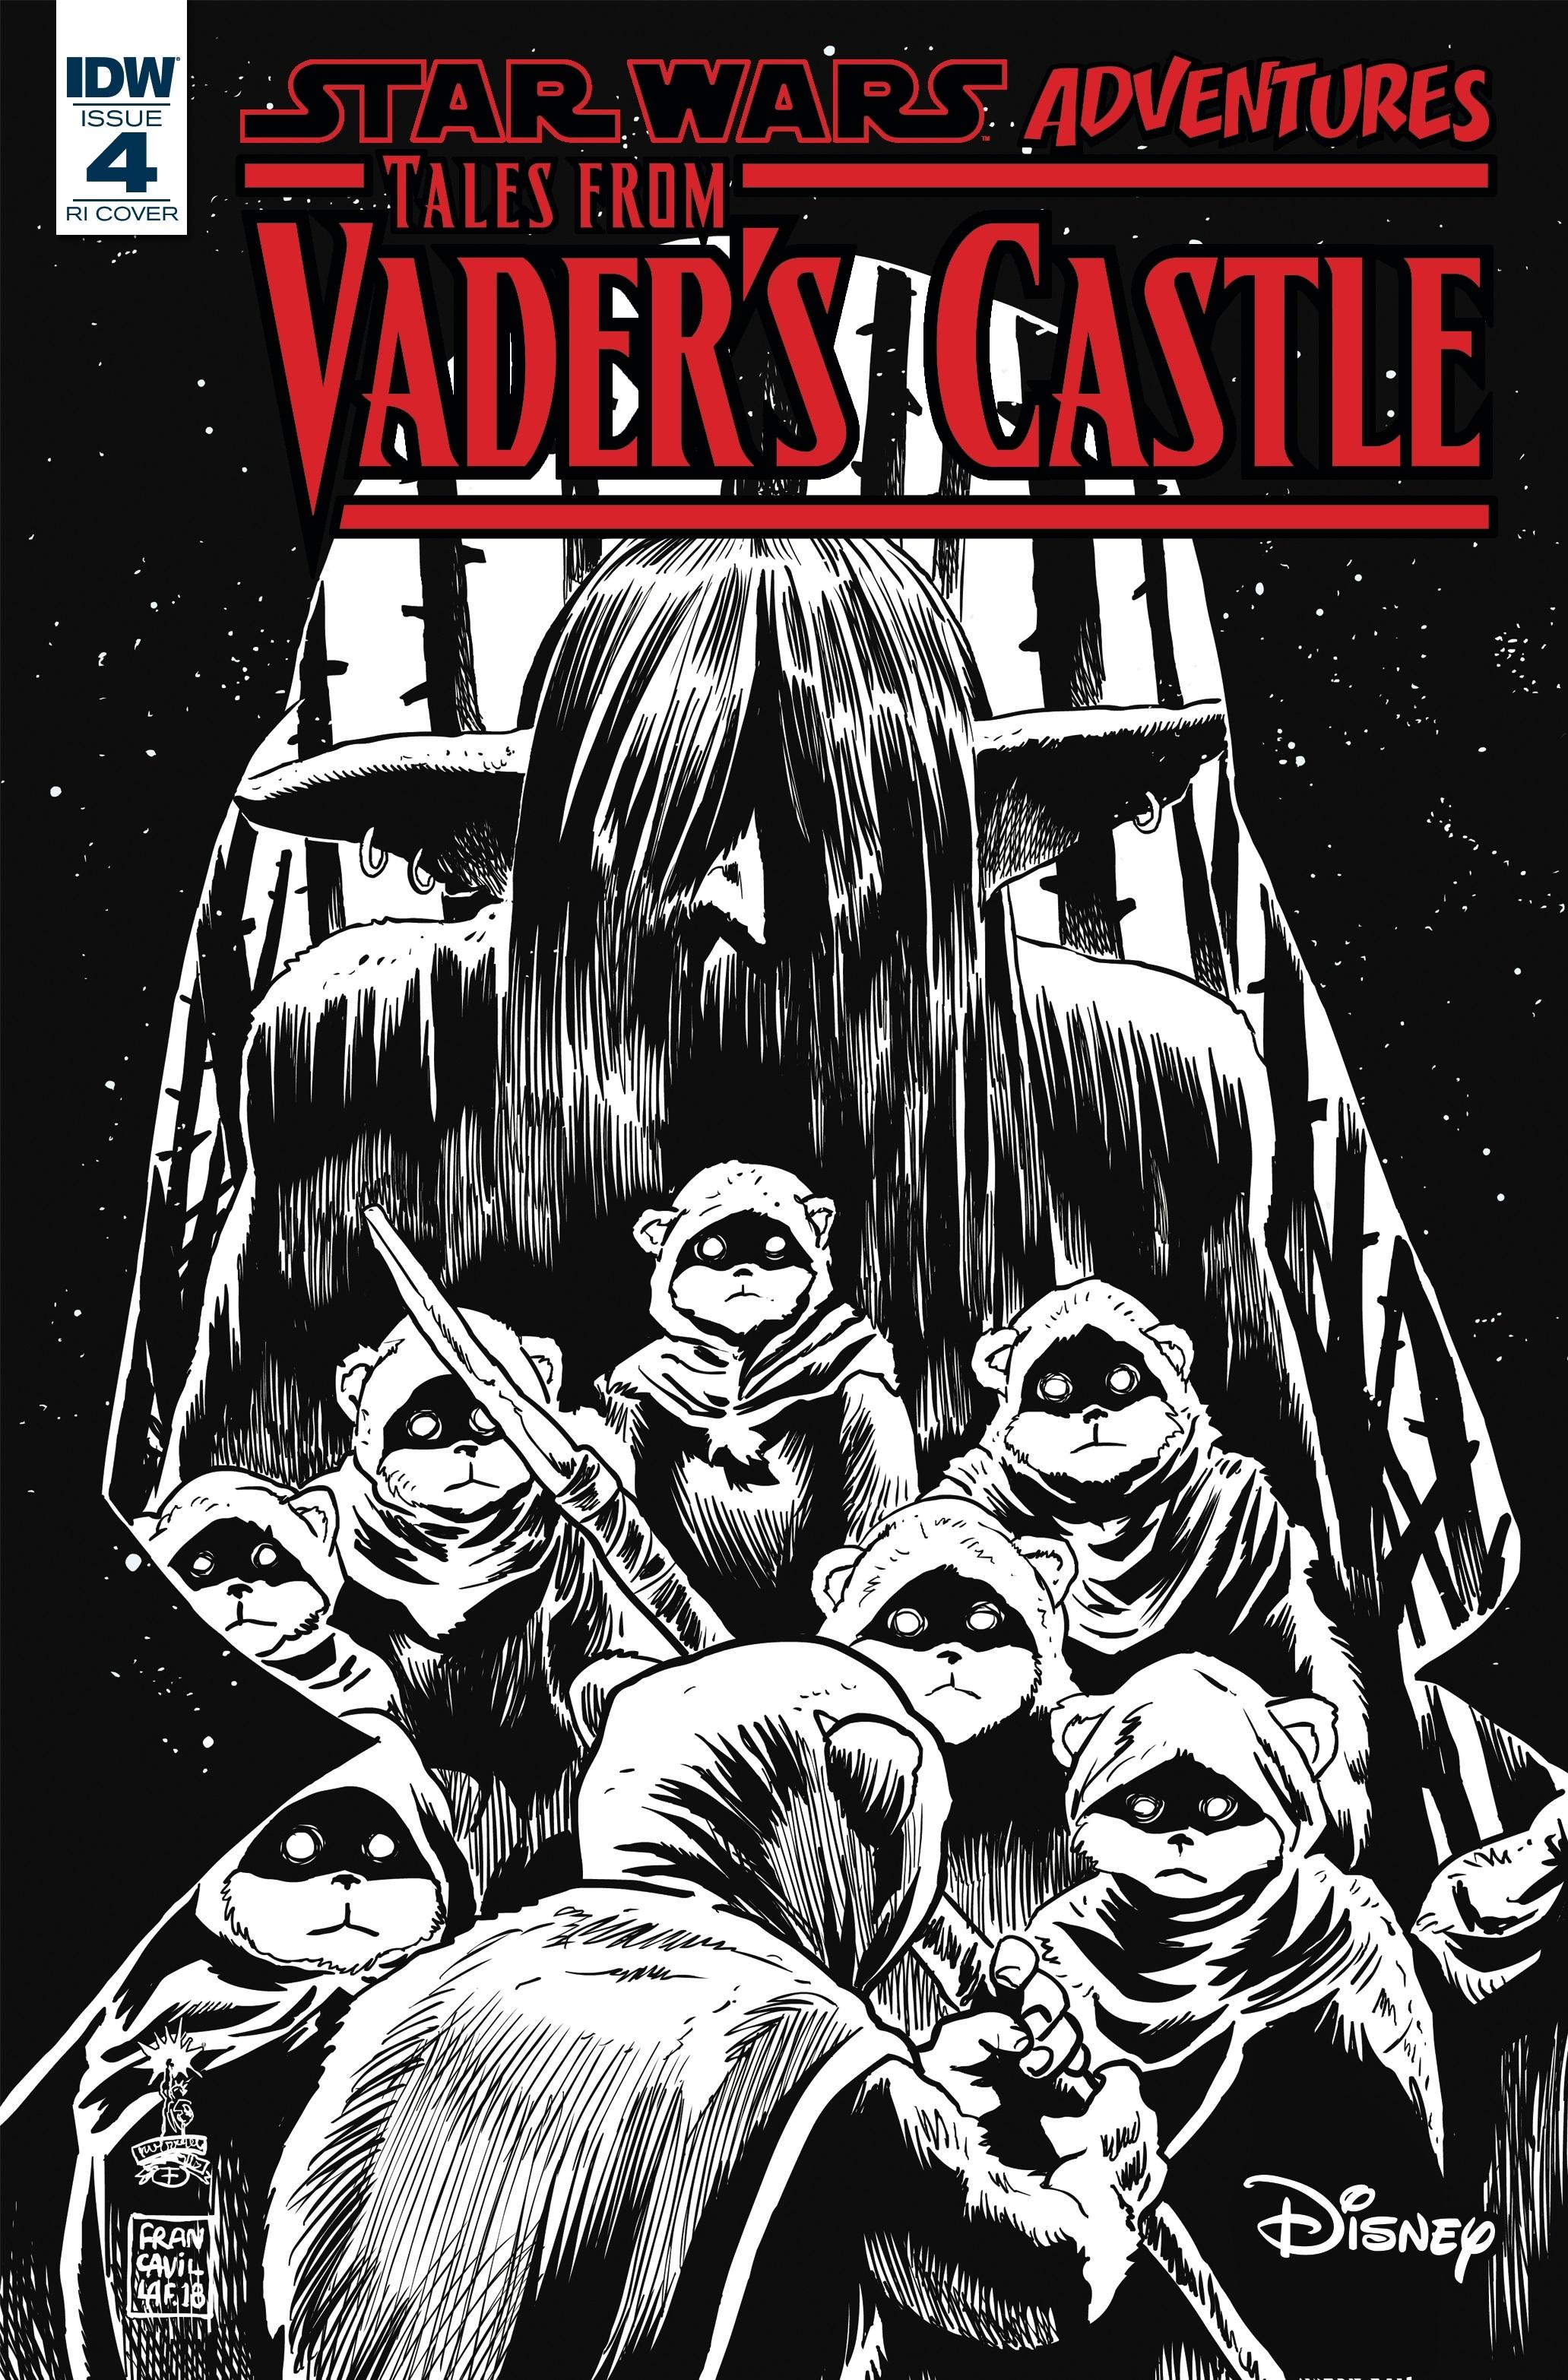 Star Wars Adventures: Tales from Vader's Castle #4 (Francesco Francavilla Black & White Variant Cover) (24.10.2018)